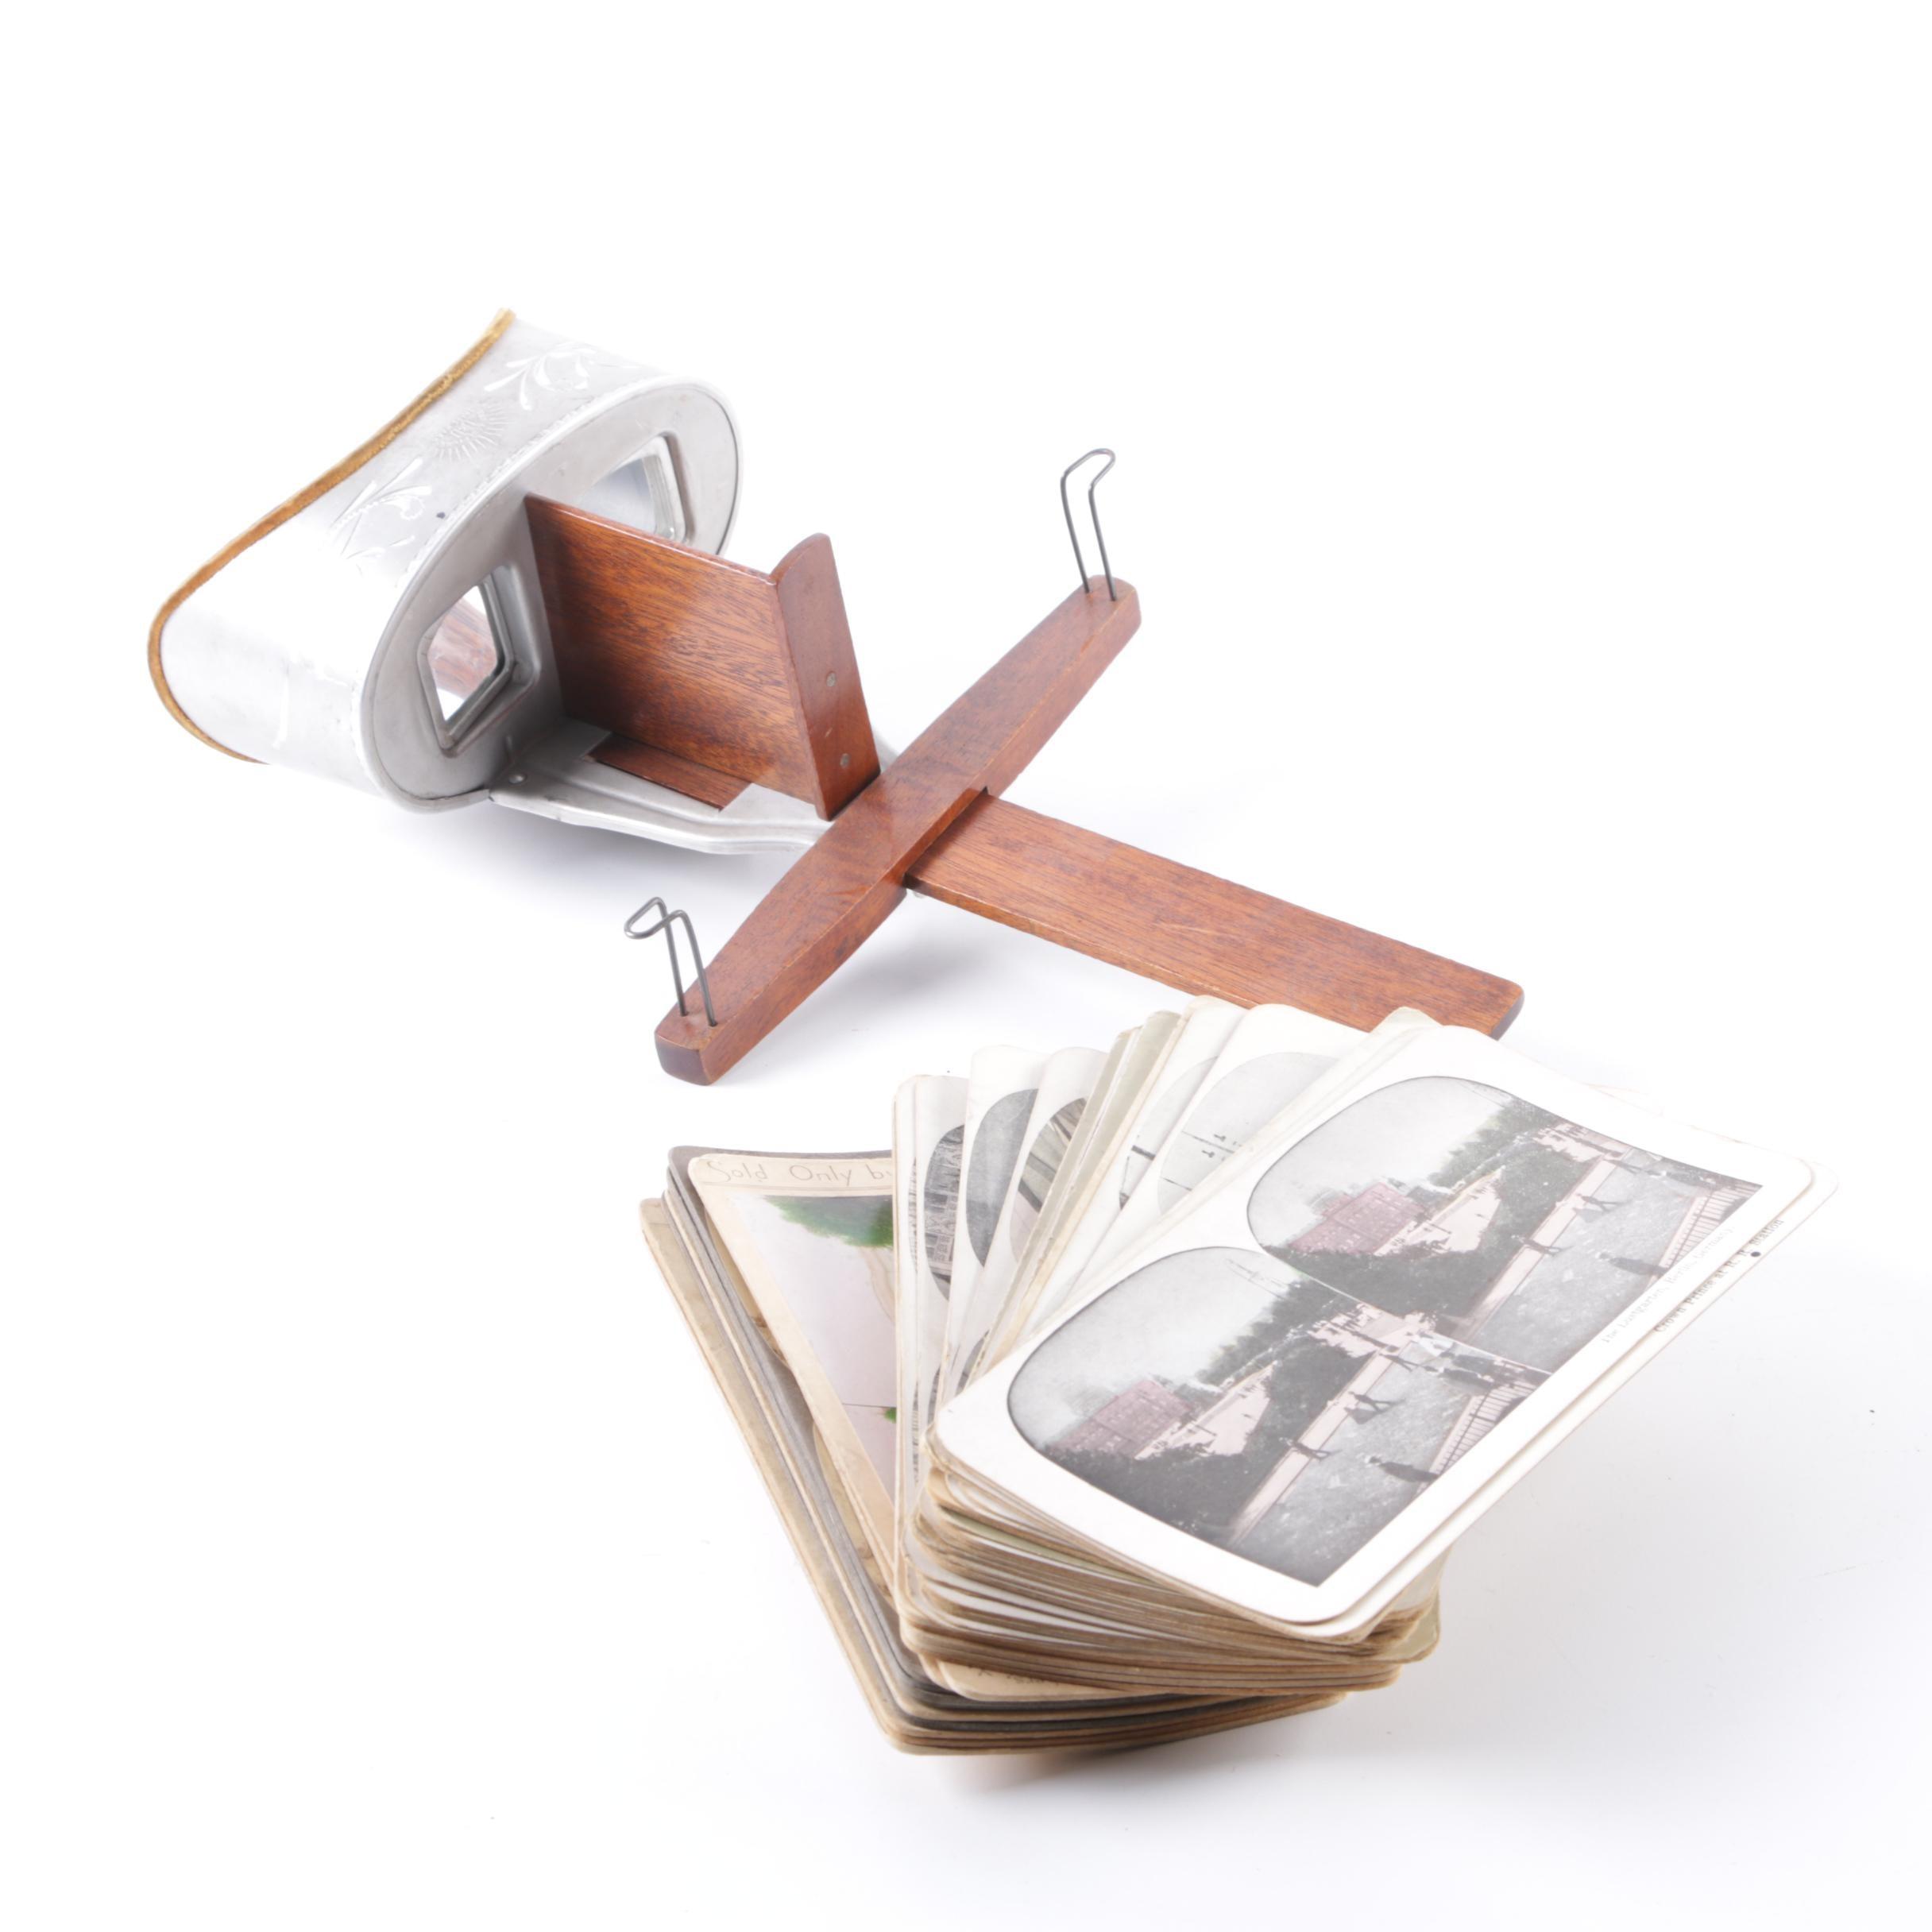 Underwood and Underwood Stereoscope and Slides